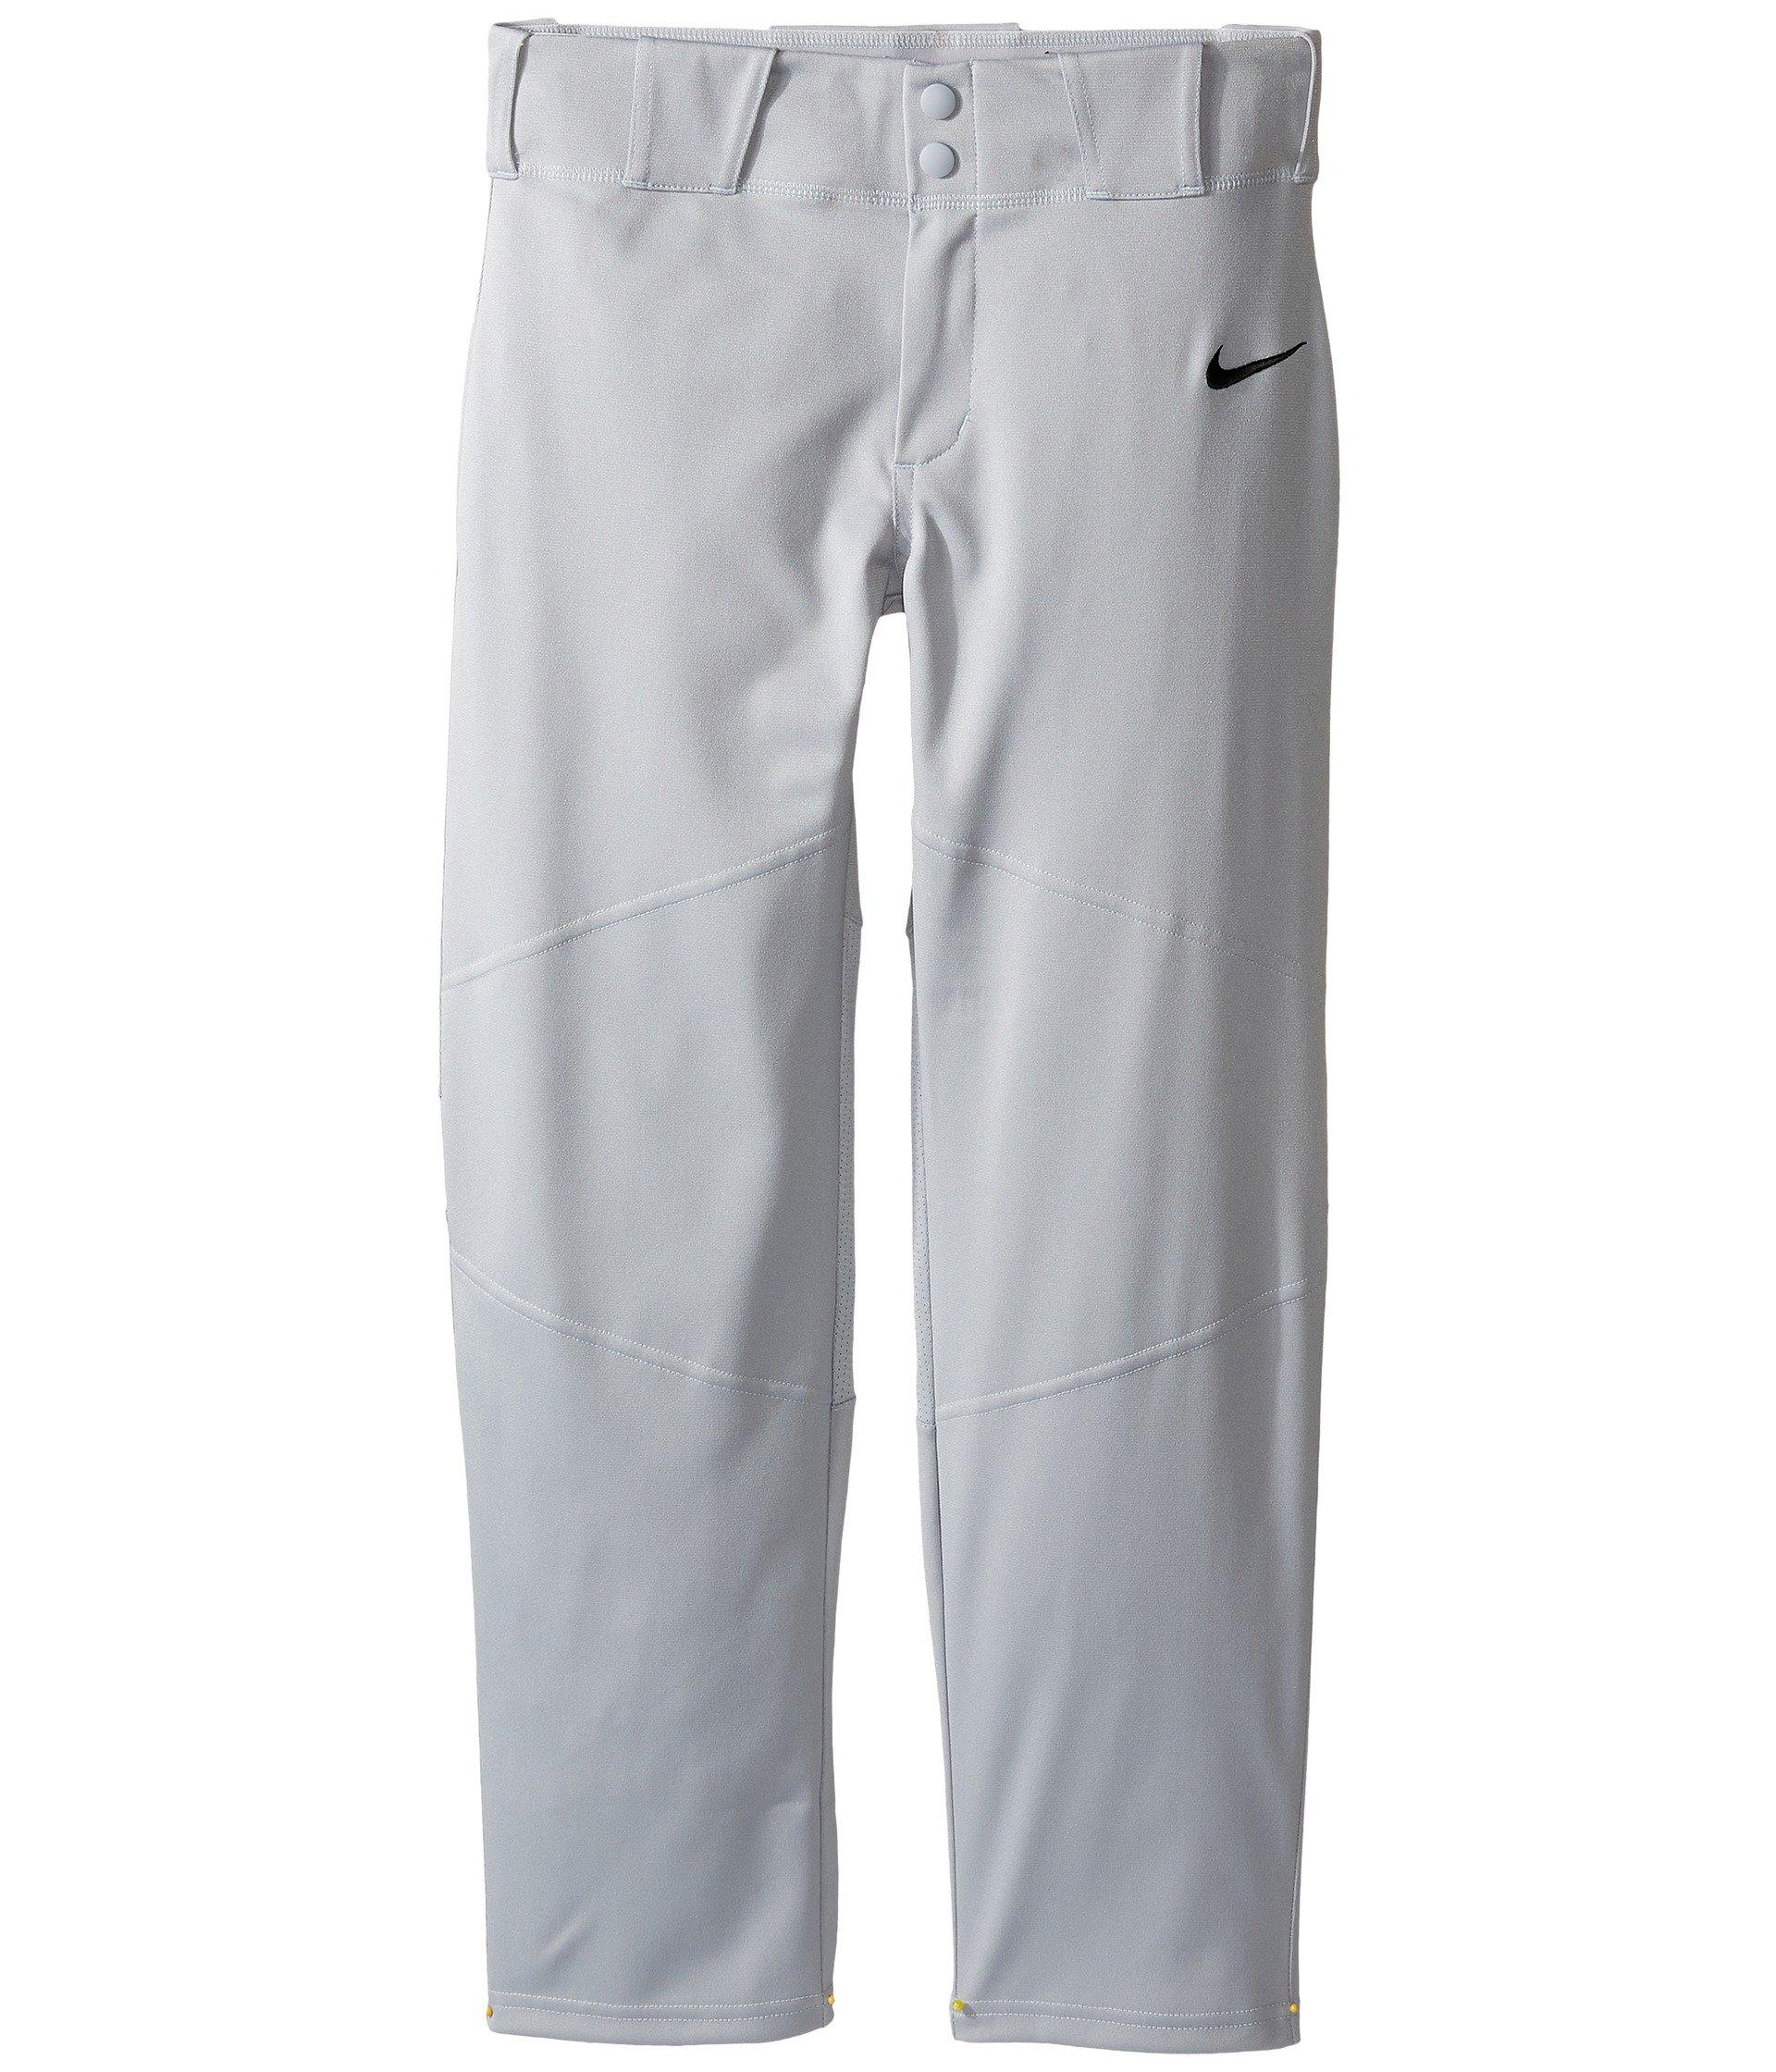 Nike Boys' Pro Vapor Baseball Pants, (Grey, M) by Nike